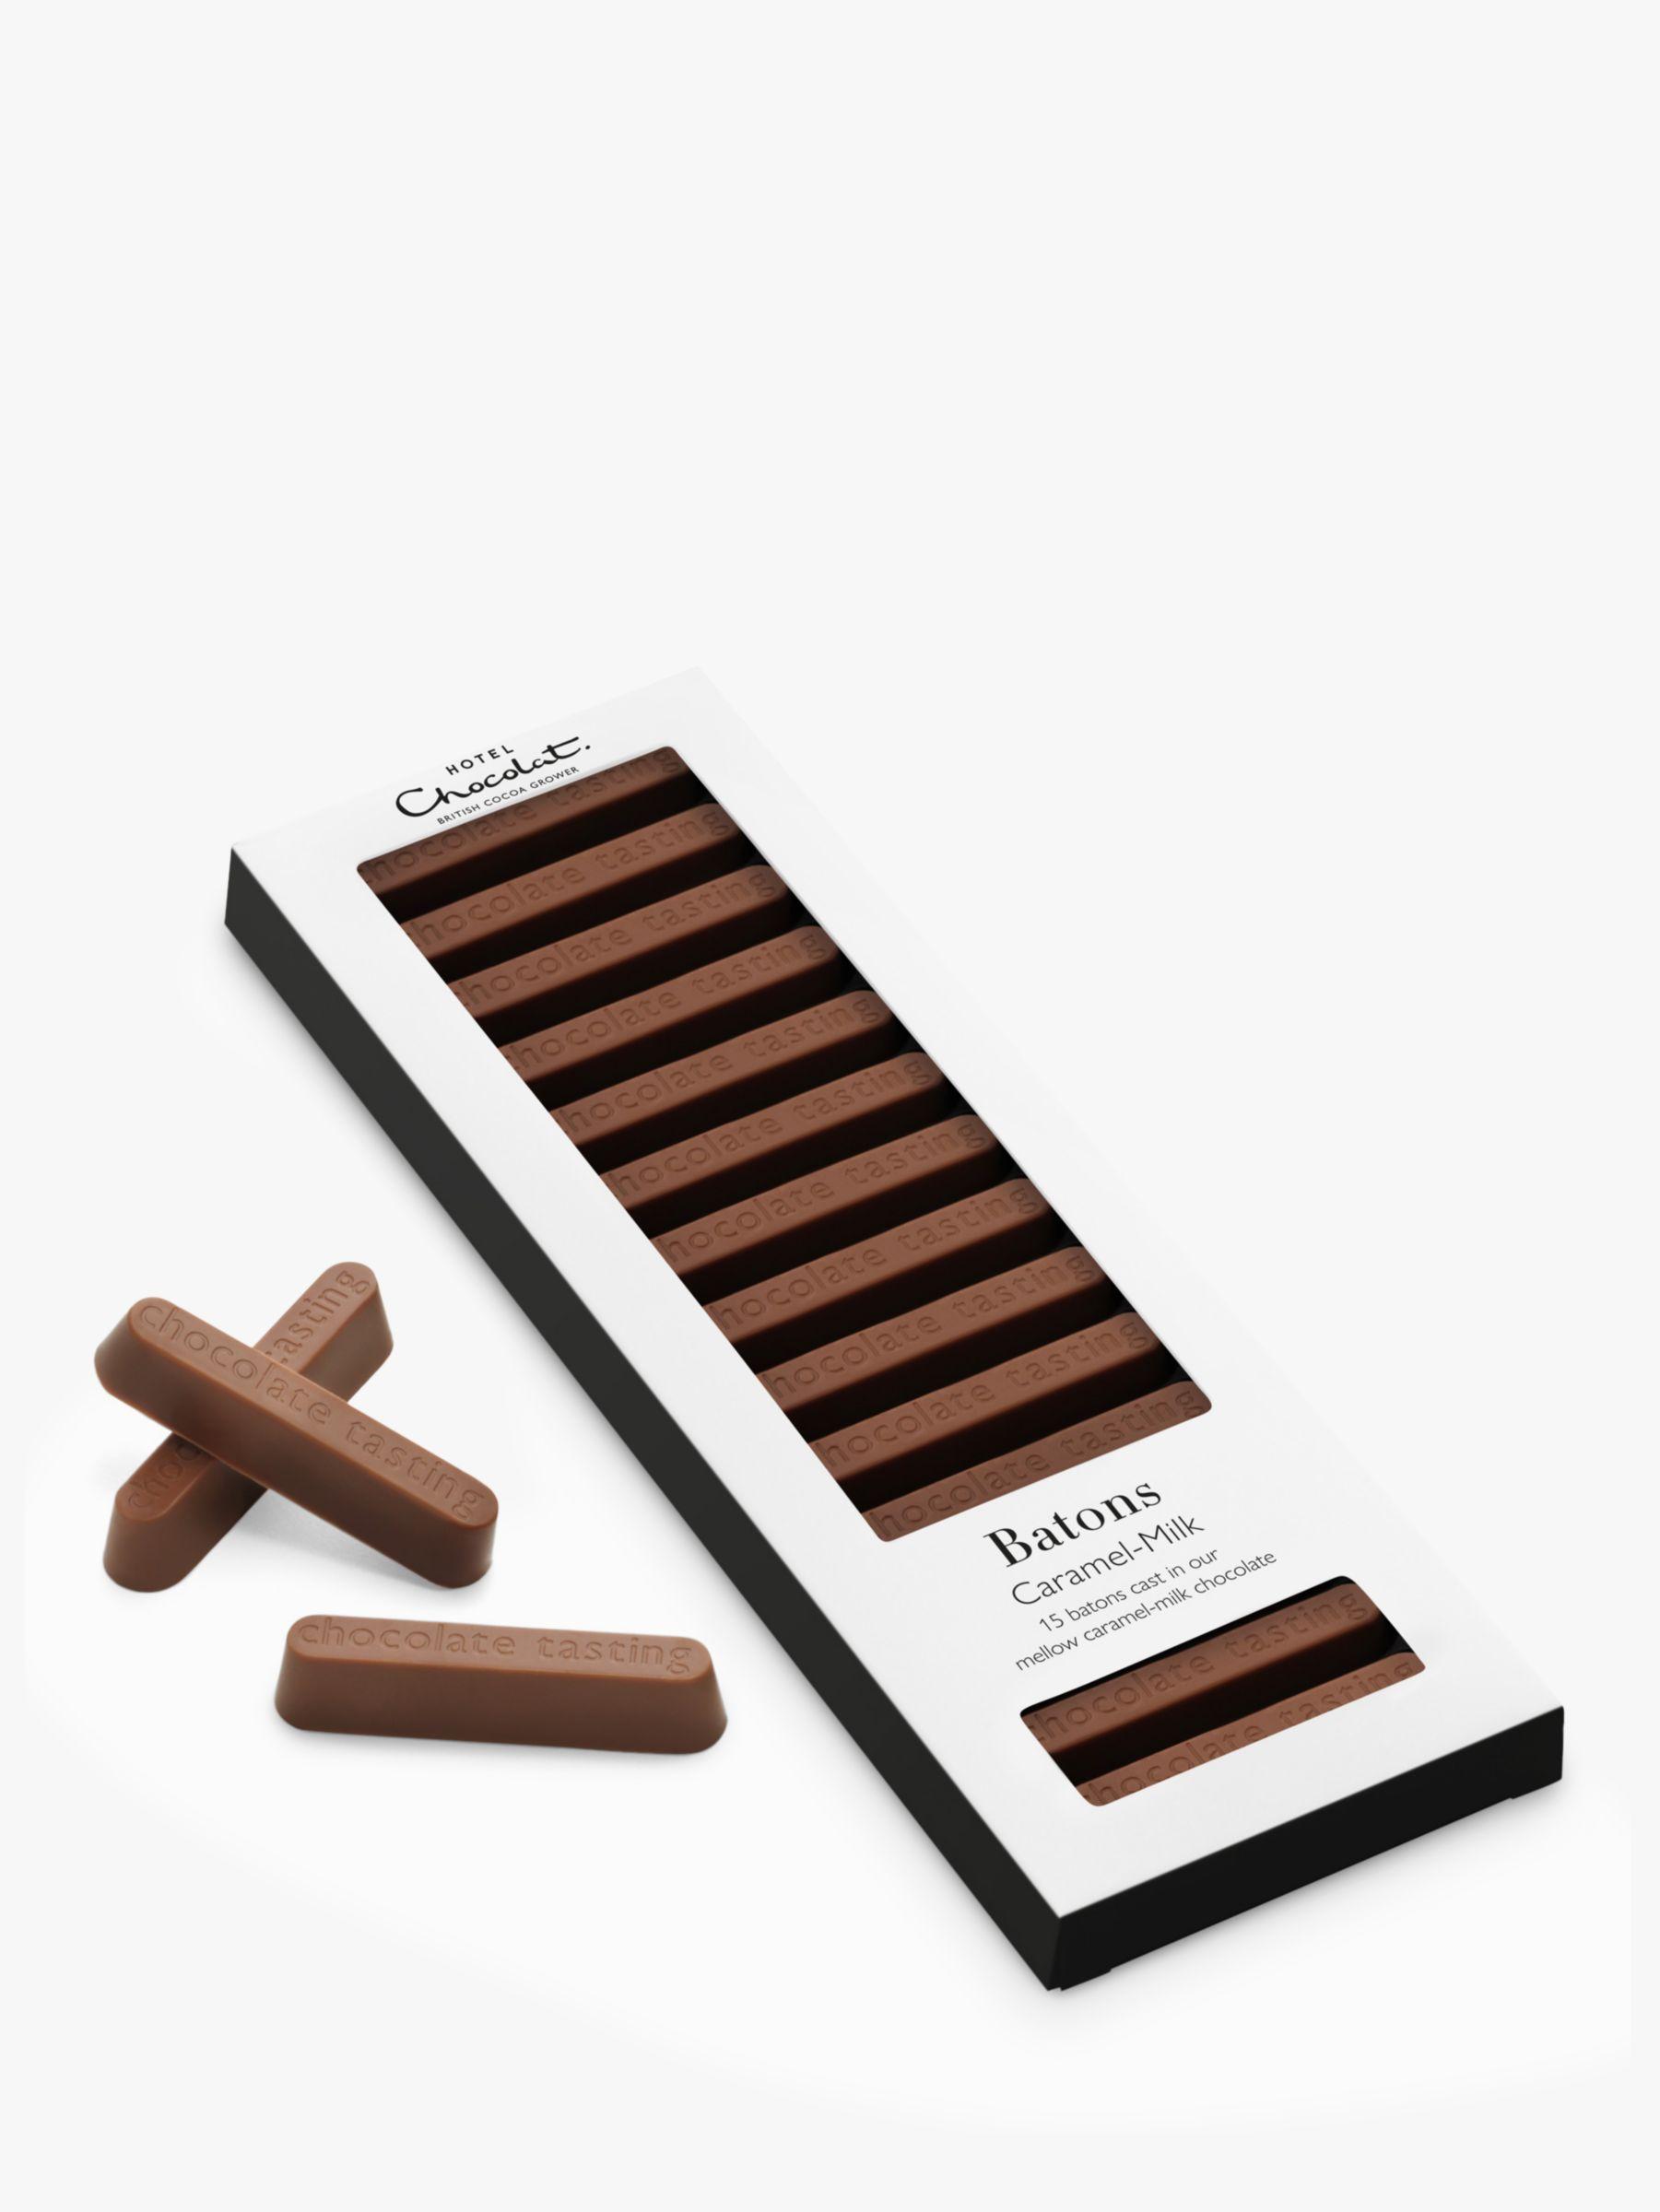 Hotel Chocolat Hotel Chocolat Caramel Milk Chocolate Batons, 120g